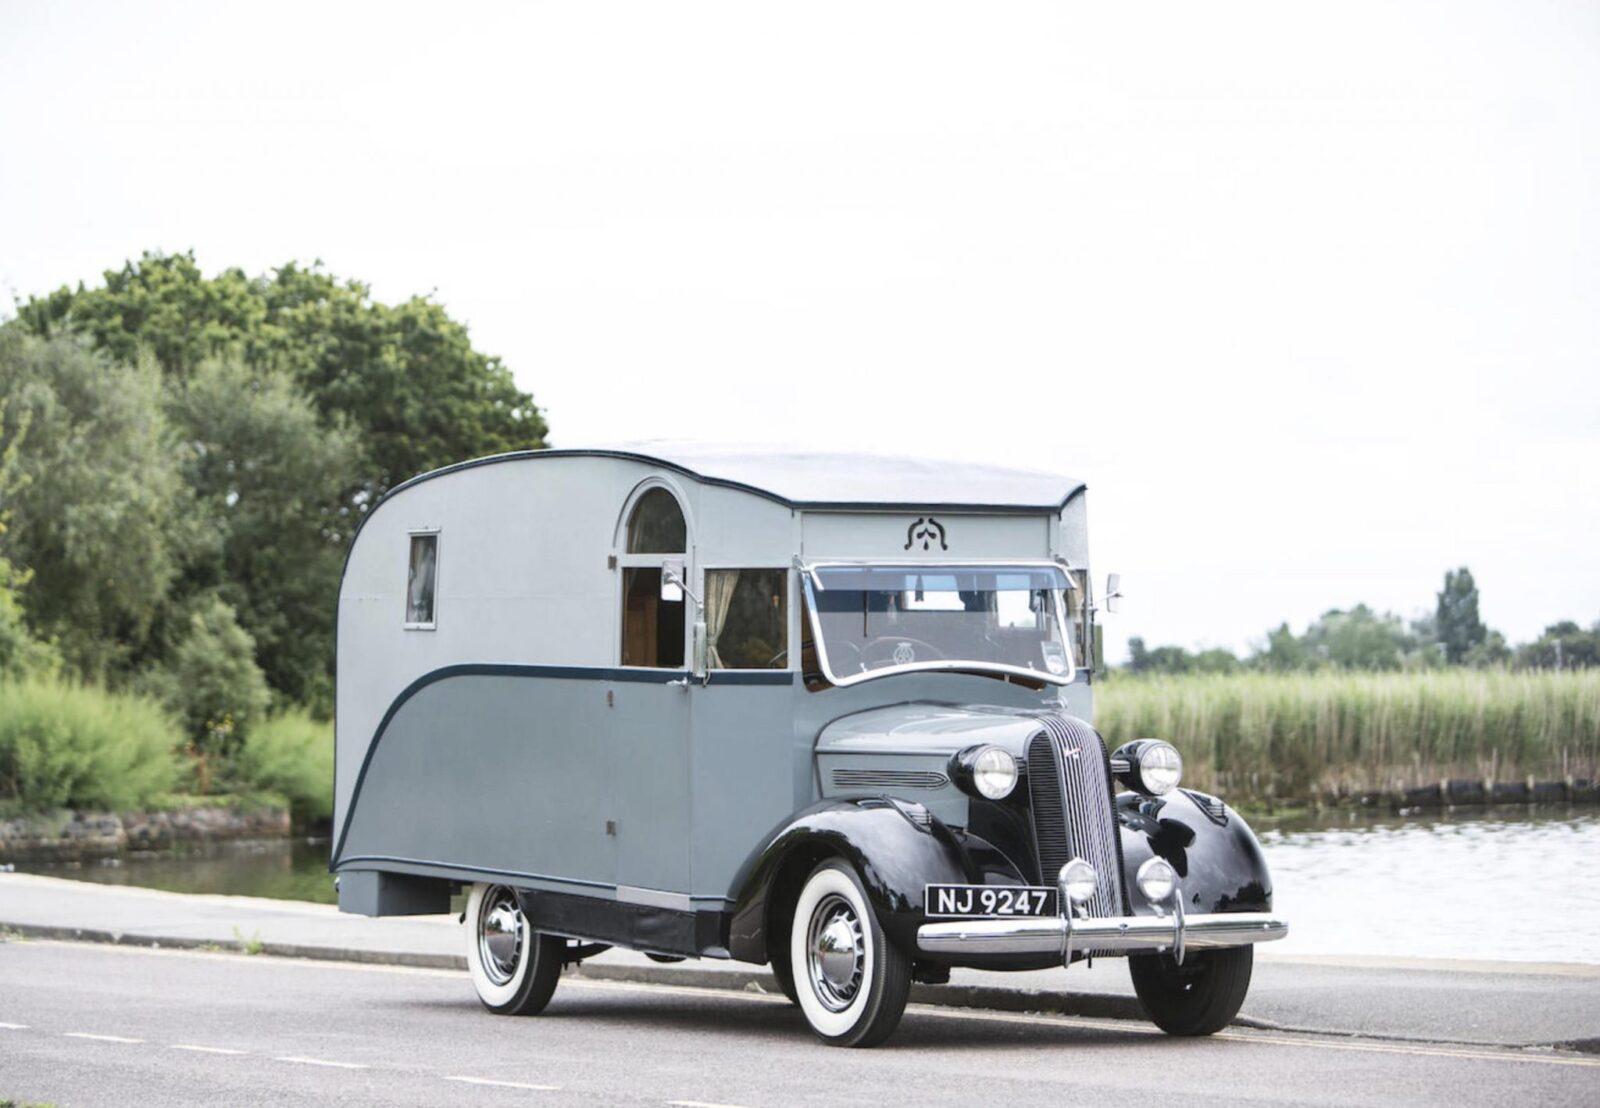 1936 Pontiac Six 4.0 Litre Motorhome 1600x1108 - 1936 Pontiac Six 4 Litre Motorhome